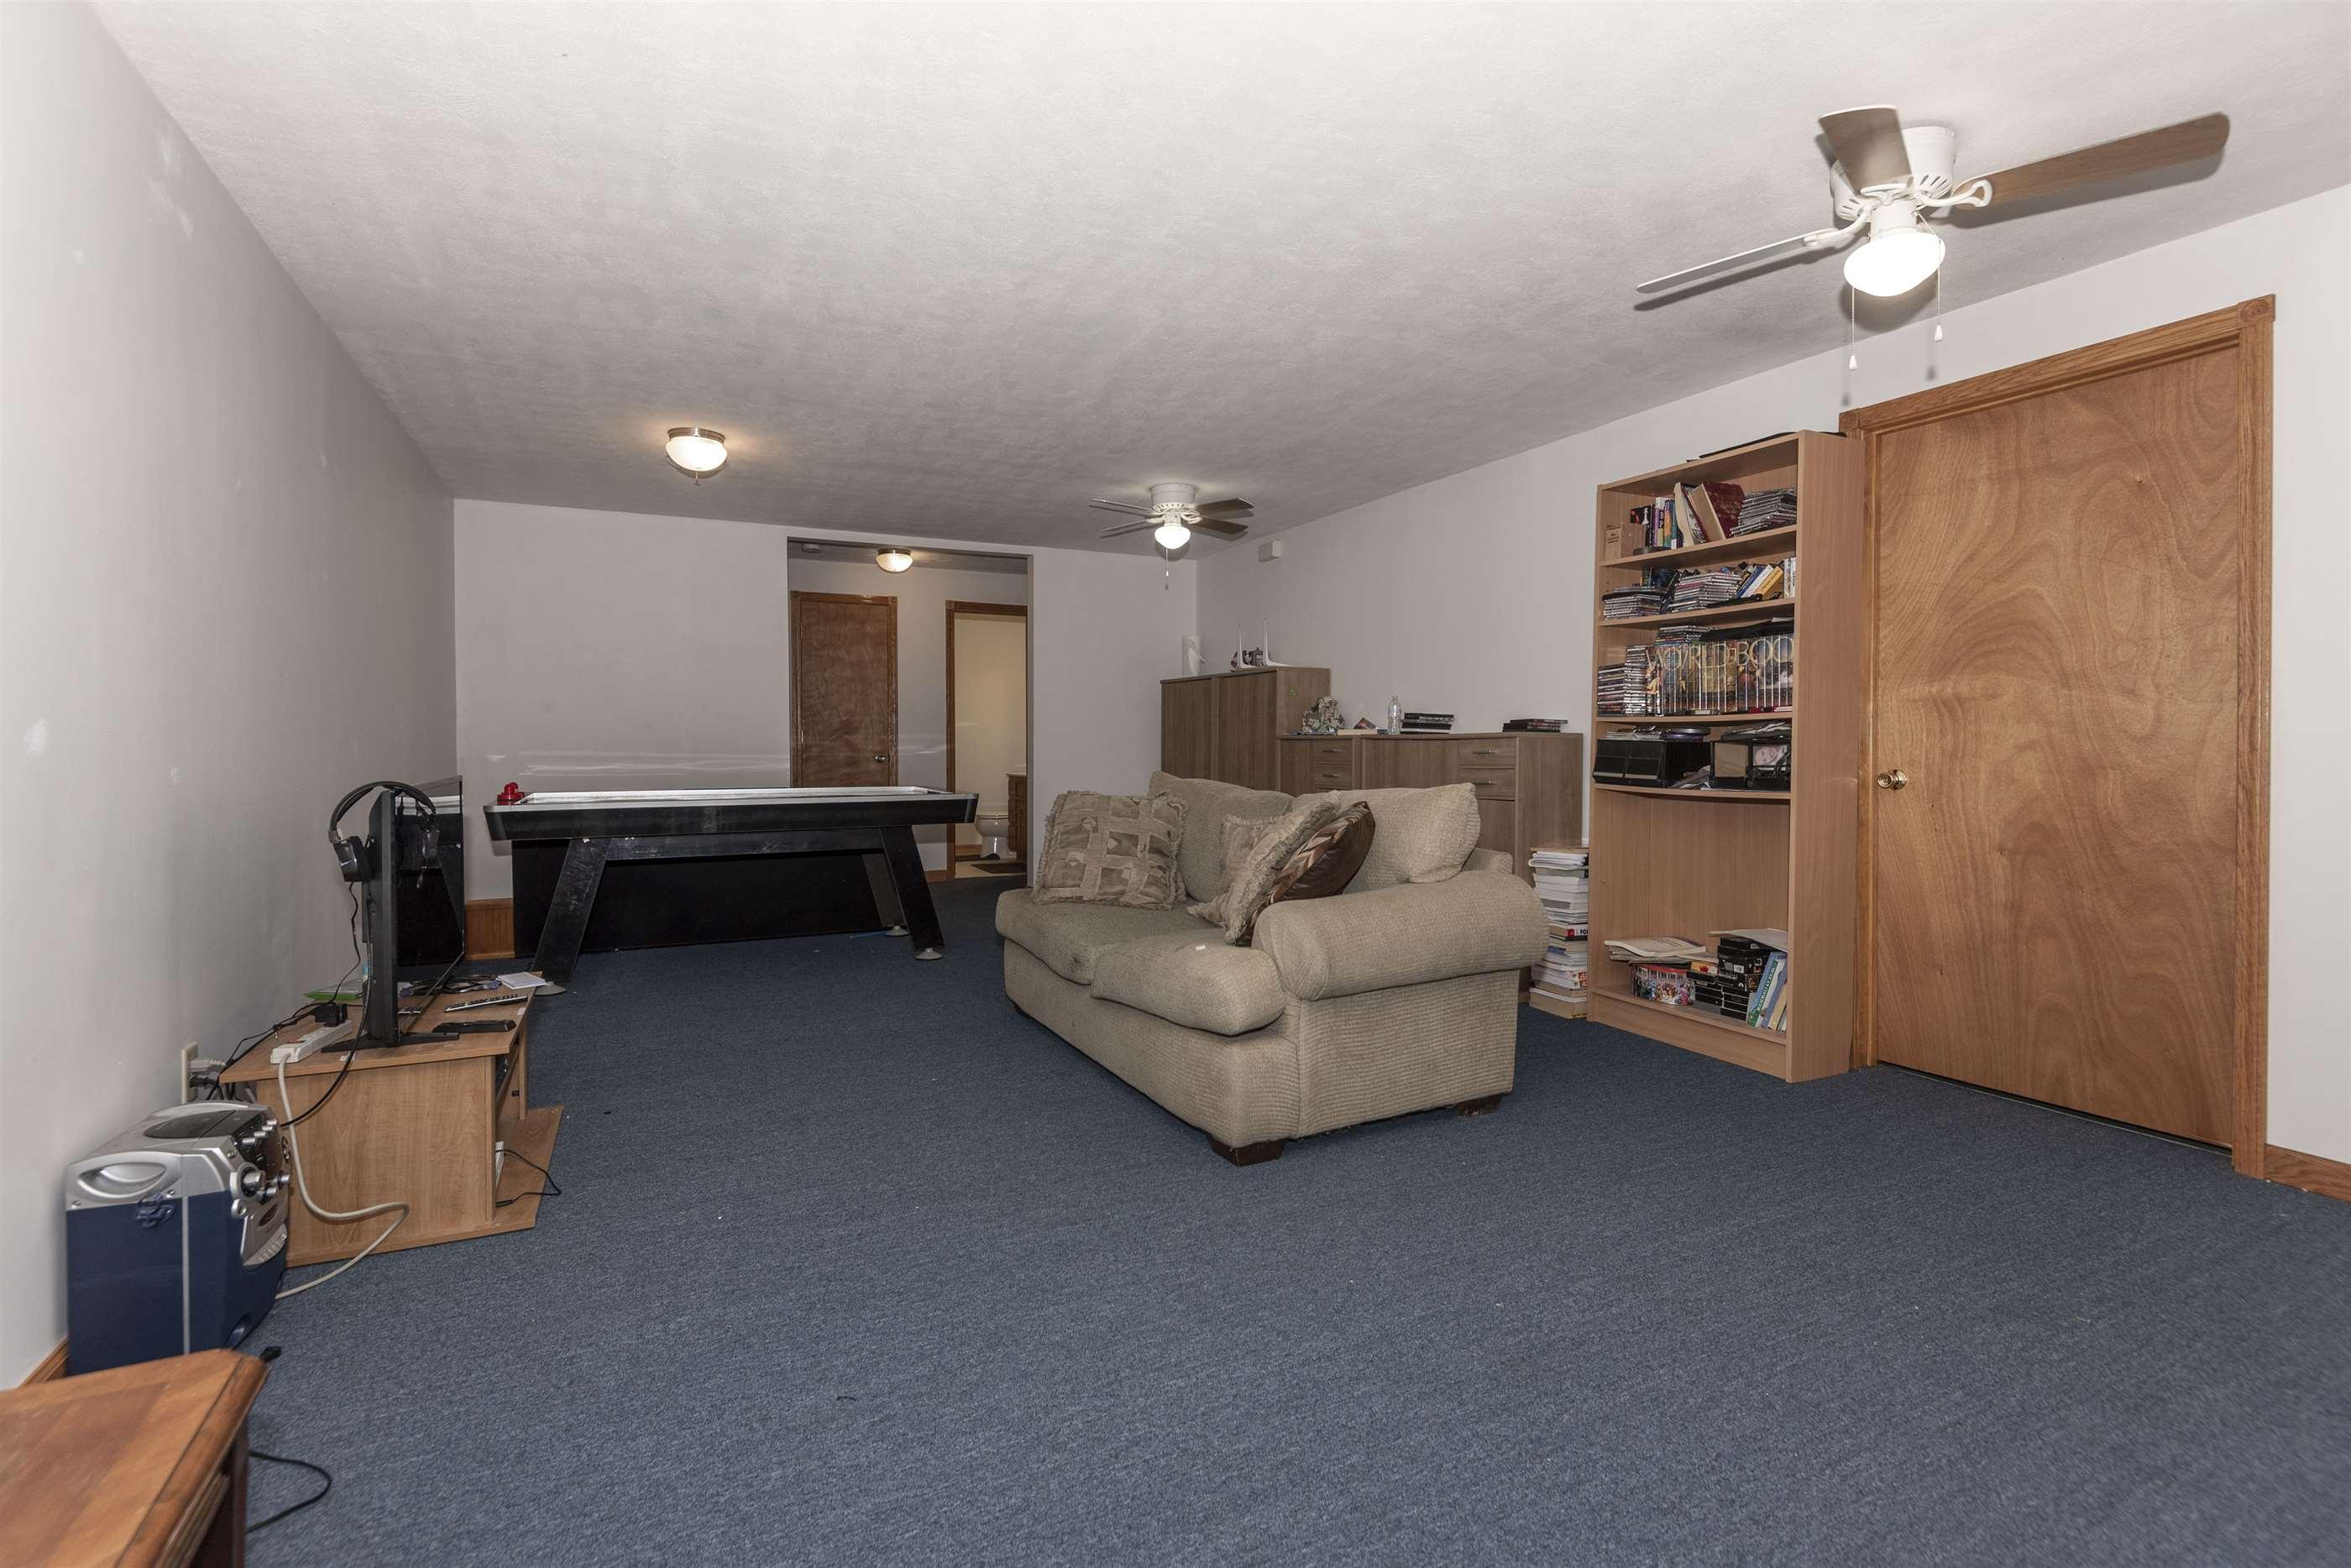 213 Cheyenne Drive, Junction City, KS 66441